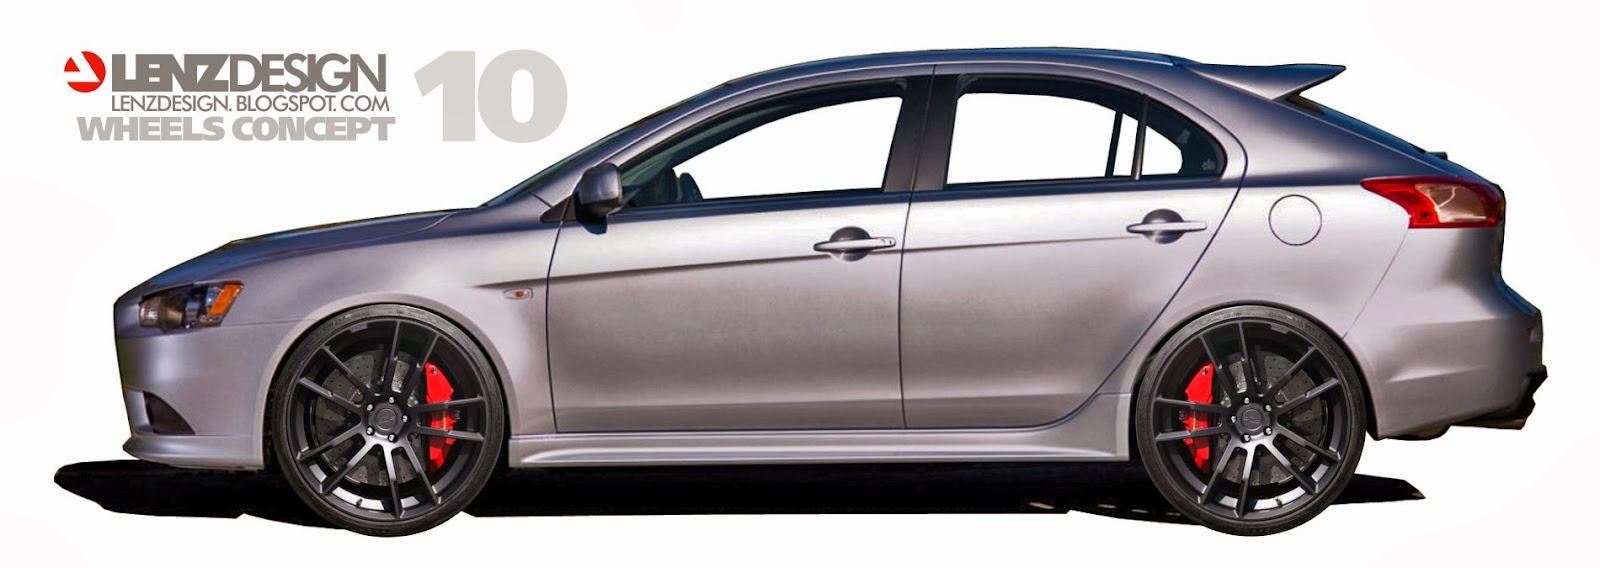 new cars : mitsubishi lancer x sportback lenzdesign performance